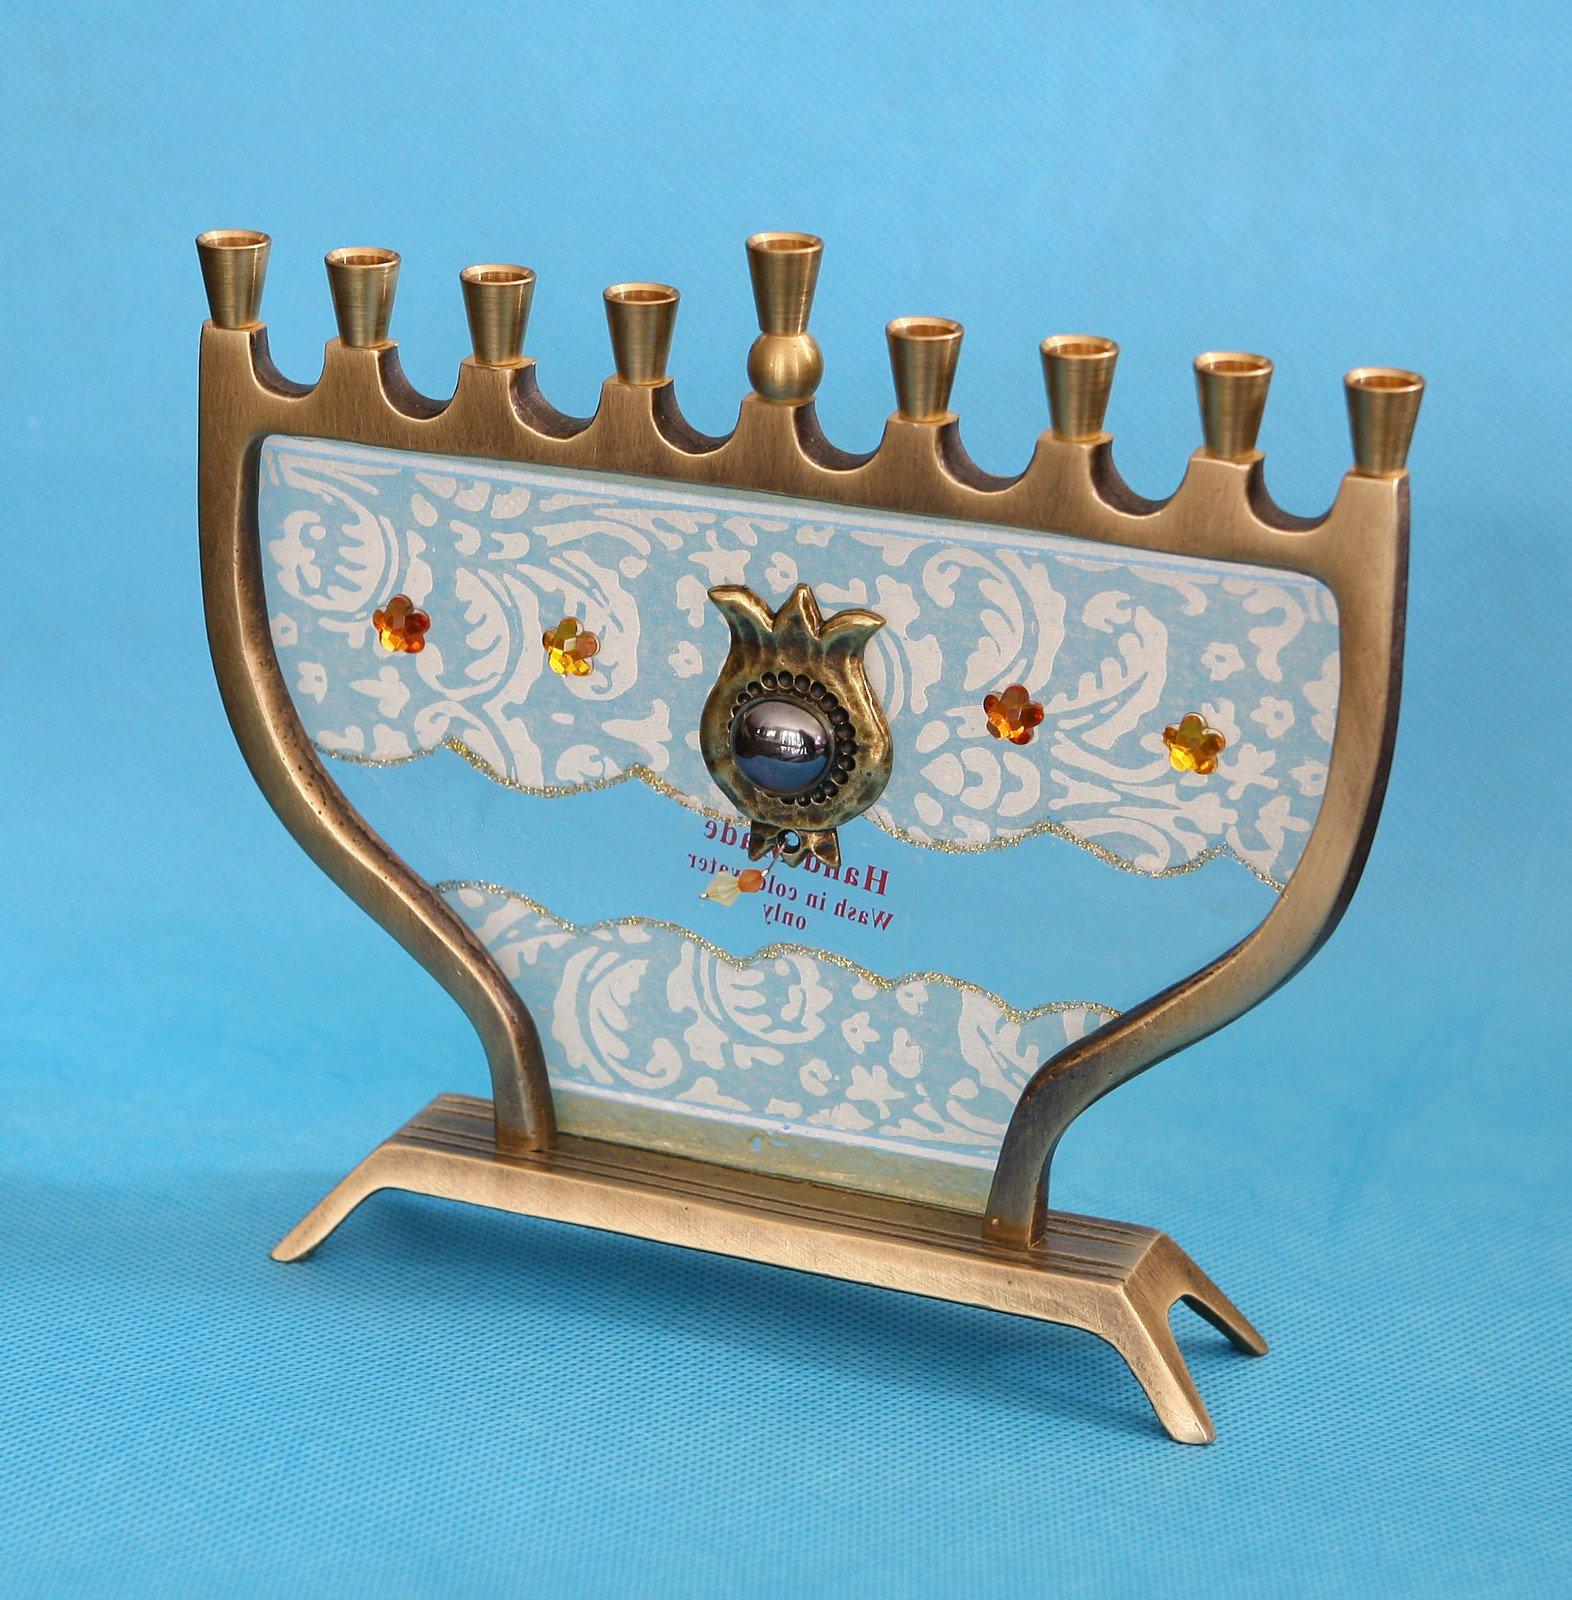 Hanukkah Menorah Hanukkia Unique Glass & Brass Collector's Decoupage design , Hand Made In ISRAEL By The Artist Lili . Great Gift For; Shabbat Chanoka Rabbi Temple Wedding Baby Naming Housewarming Bar Mitzvah Bat Mitzva and Jewish Homes.